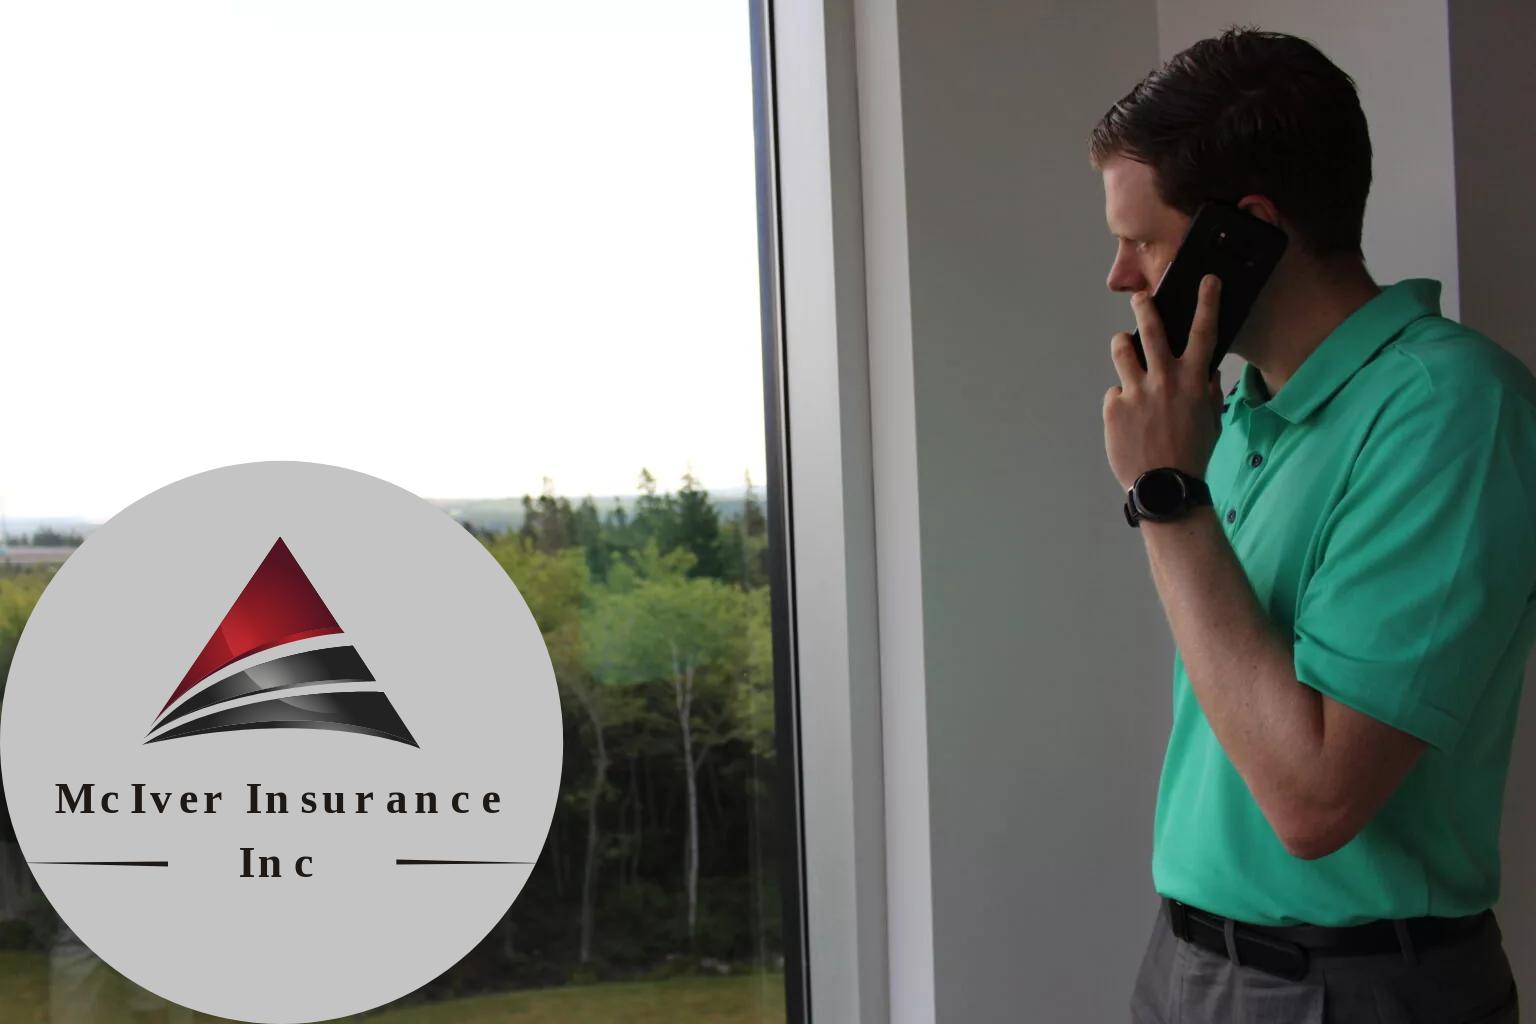 Health Insurance Nova Scotia - Patrick Mciver - Halifax